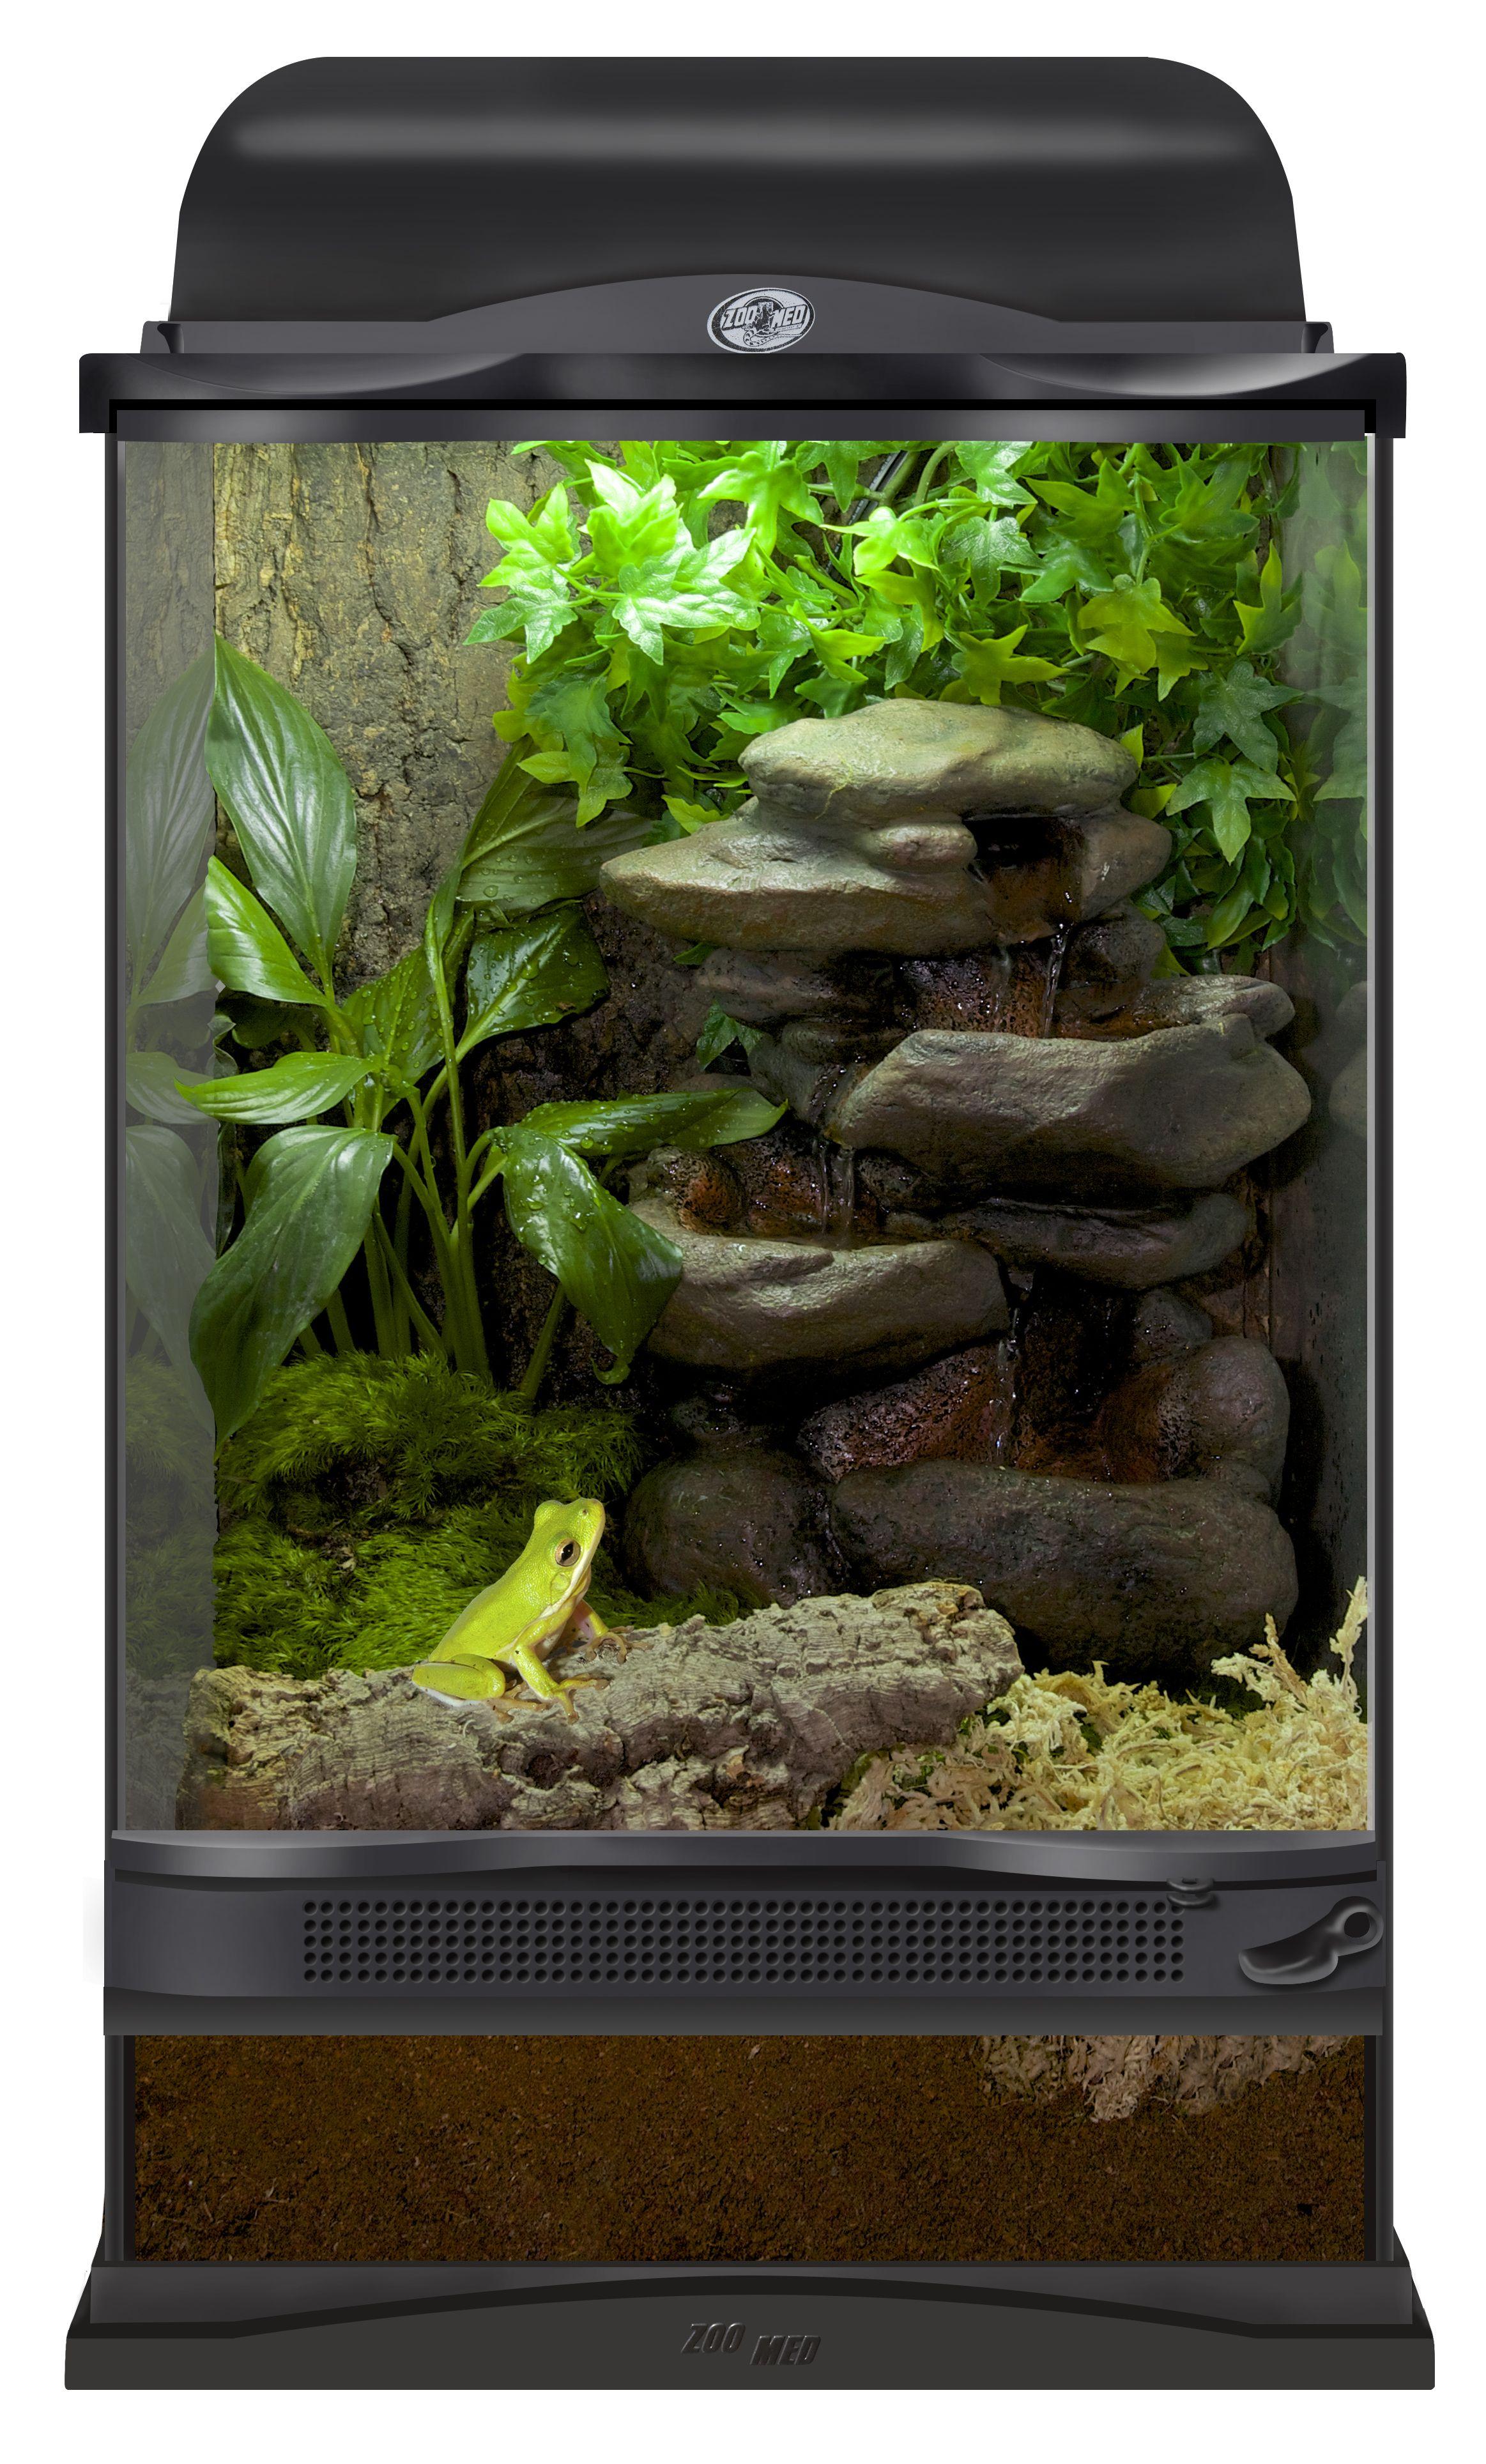 Xx zoo med terrarium setup for a tree frog diy this terrarium